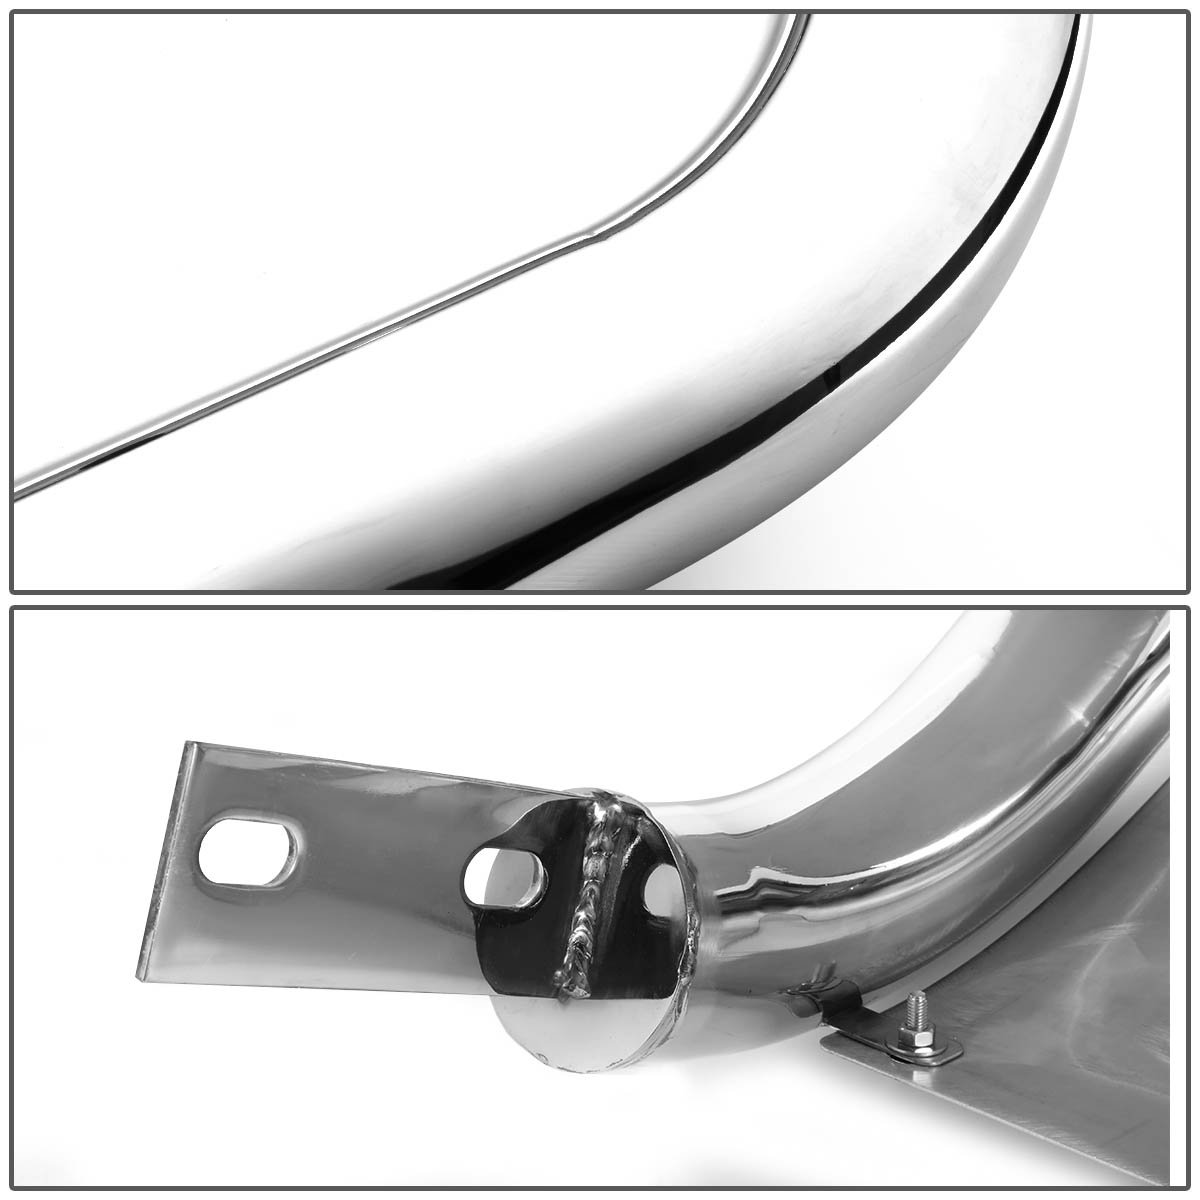 Chrome For Nissan Pathfinder R52 3 Bumper Push Bull Bar+Removable Skid Plate